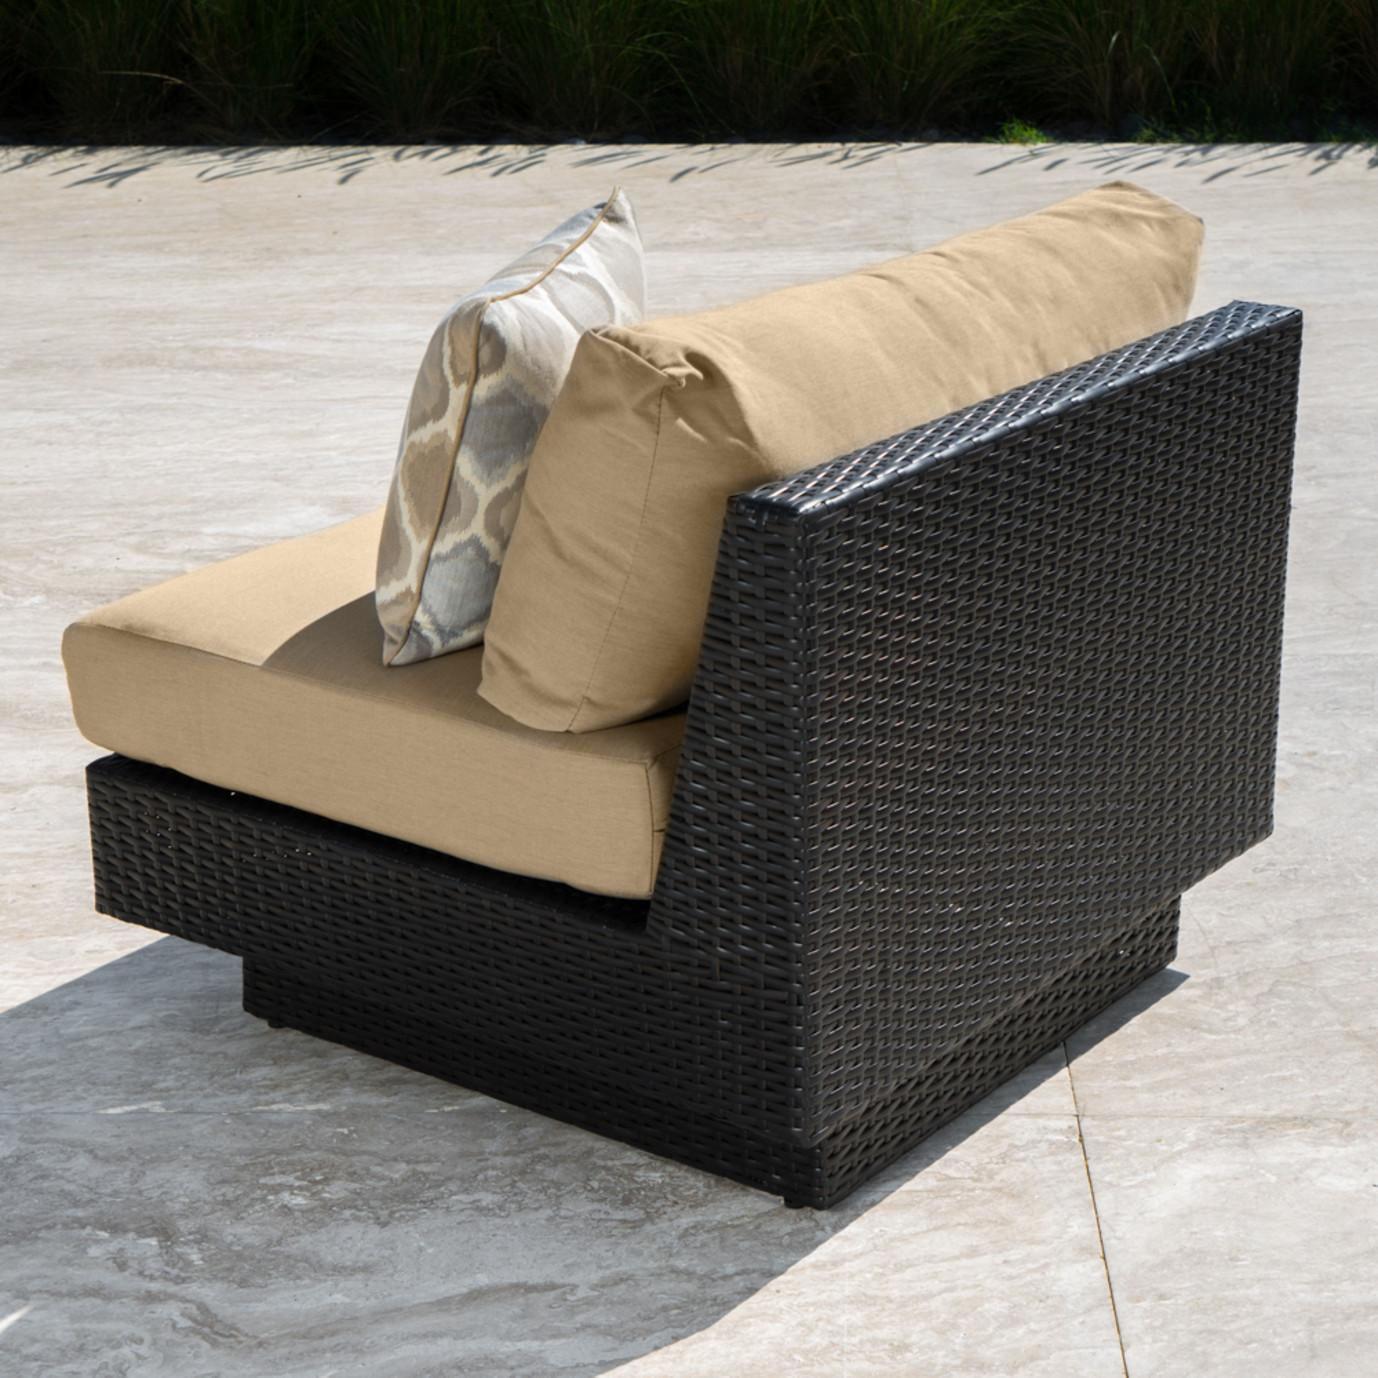 Portofino™ Comfort 6pc Sofa Sectional - Heather Beige